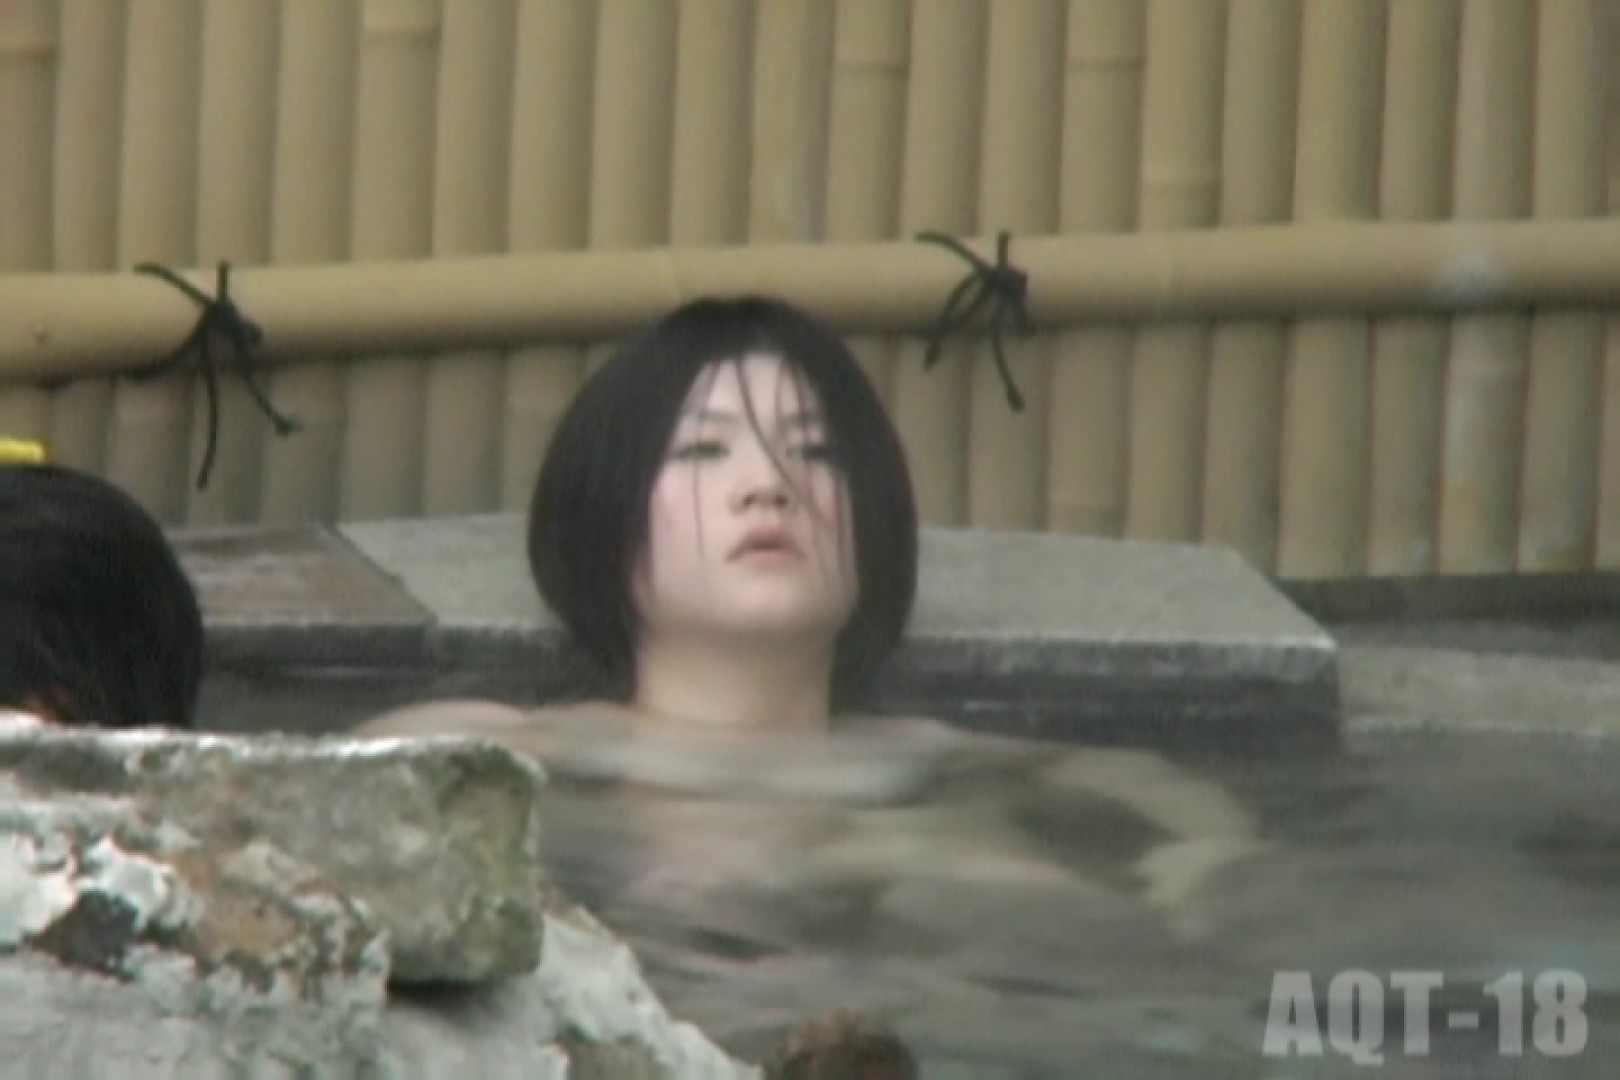 Aquaな露天風呂Vol.859 盗撮 戯れ無修正画像 76連発 8